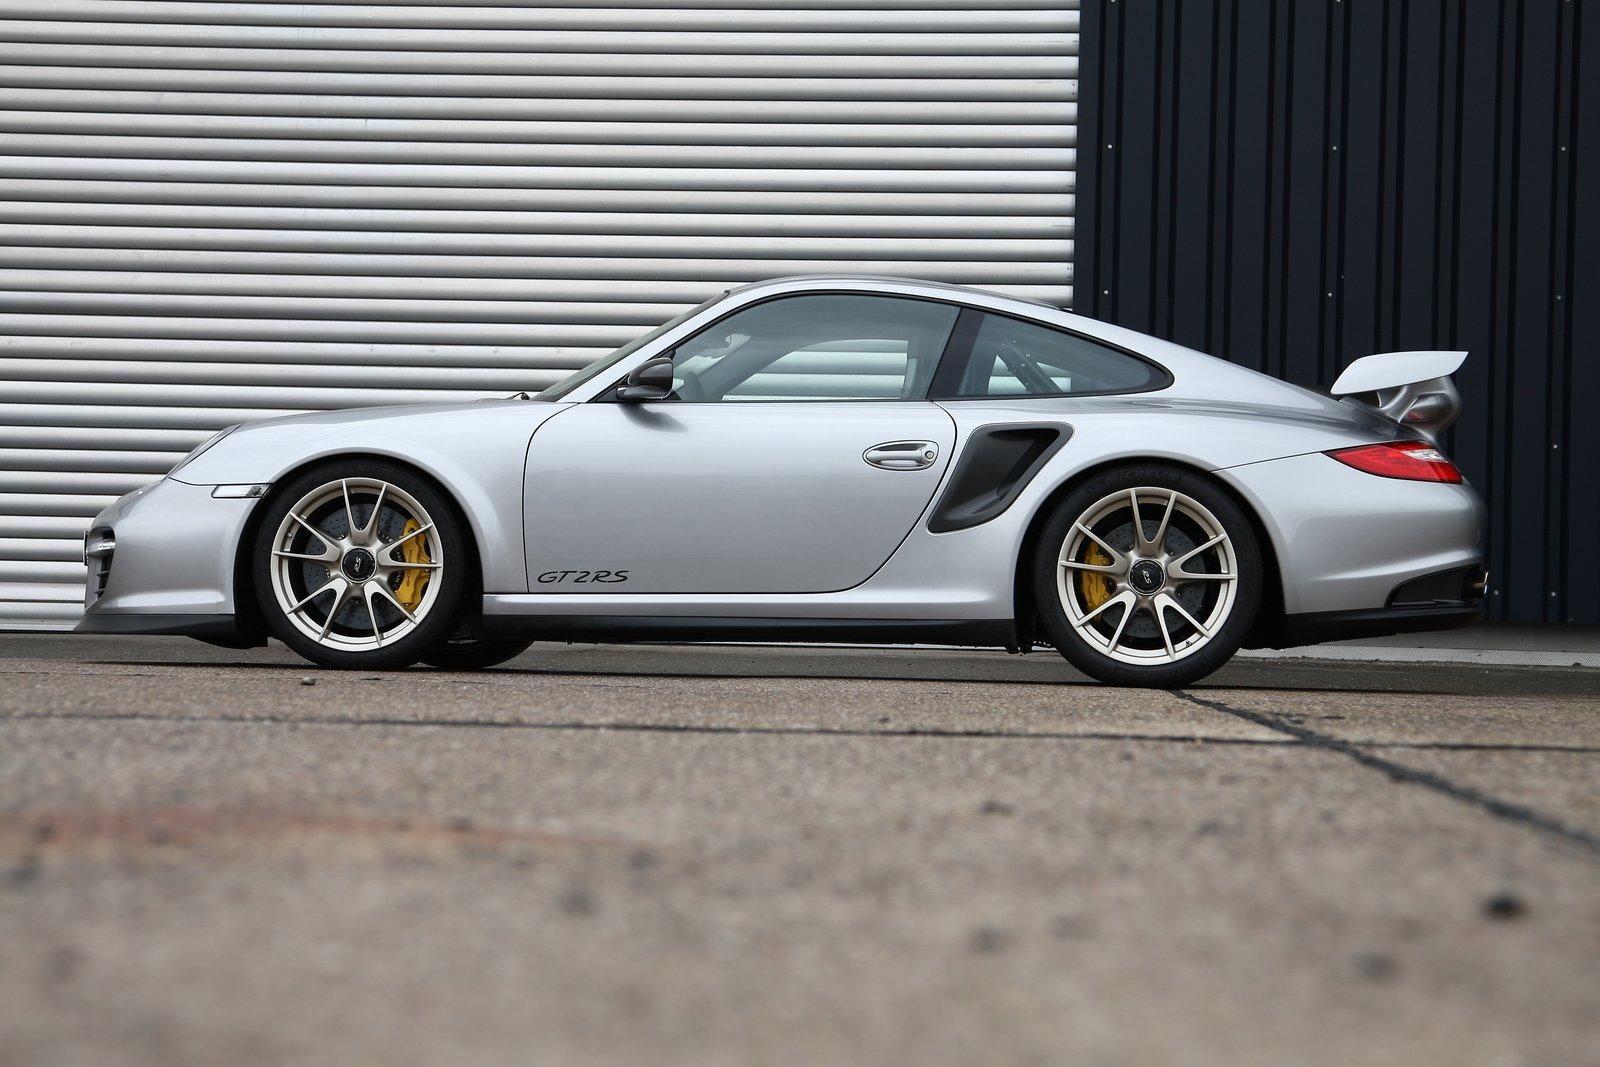 Porsche 997 Gt2 Rs 2011 Porsche 911 Porsche 911 997 Porsche